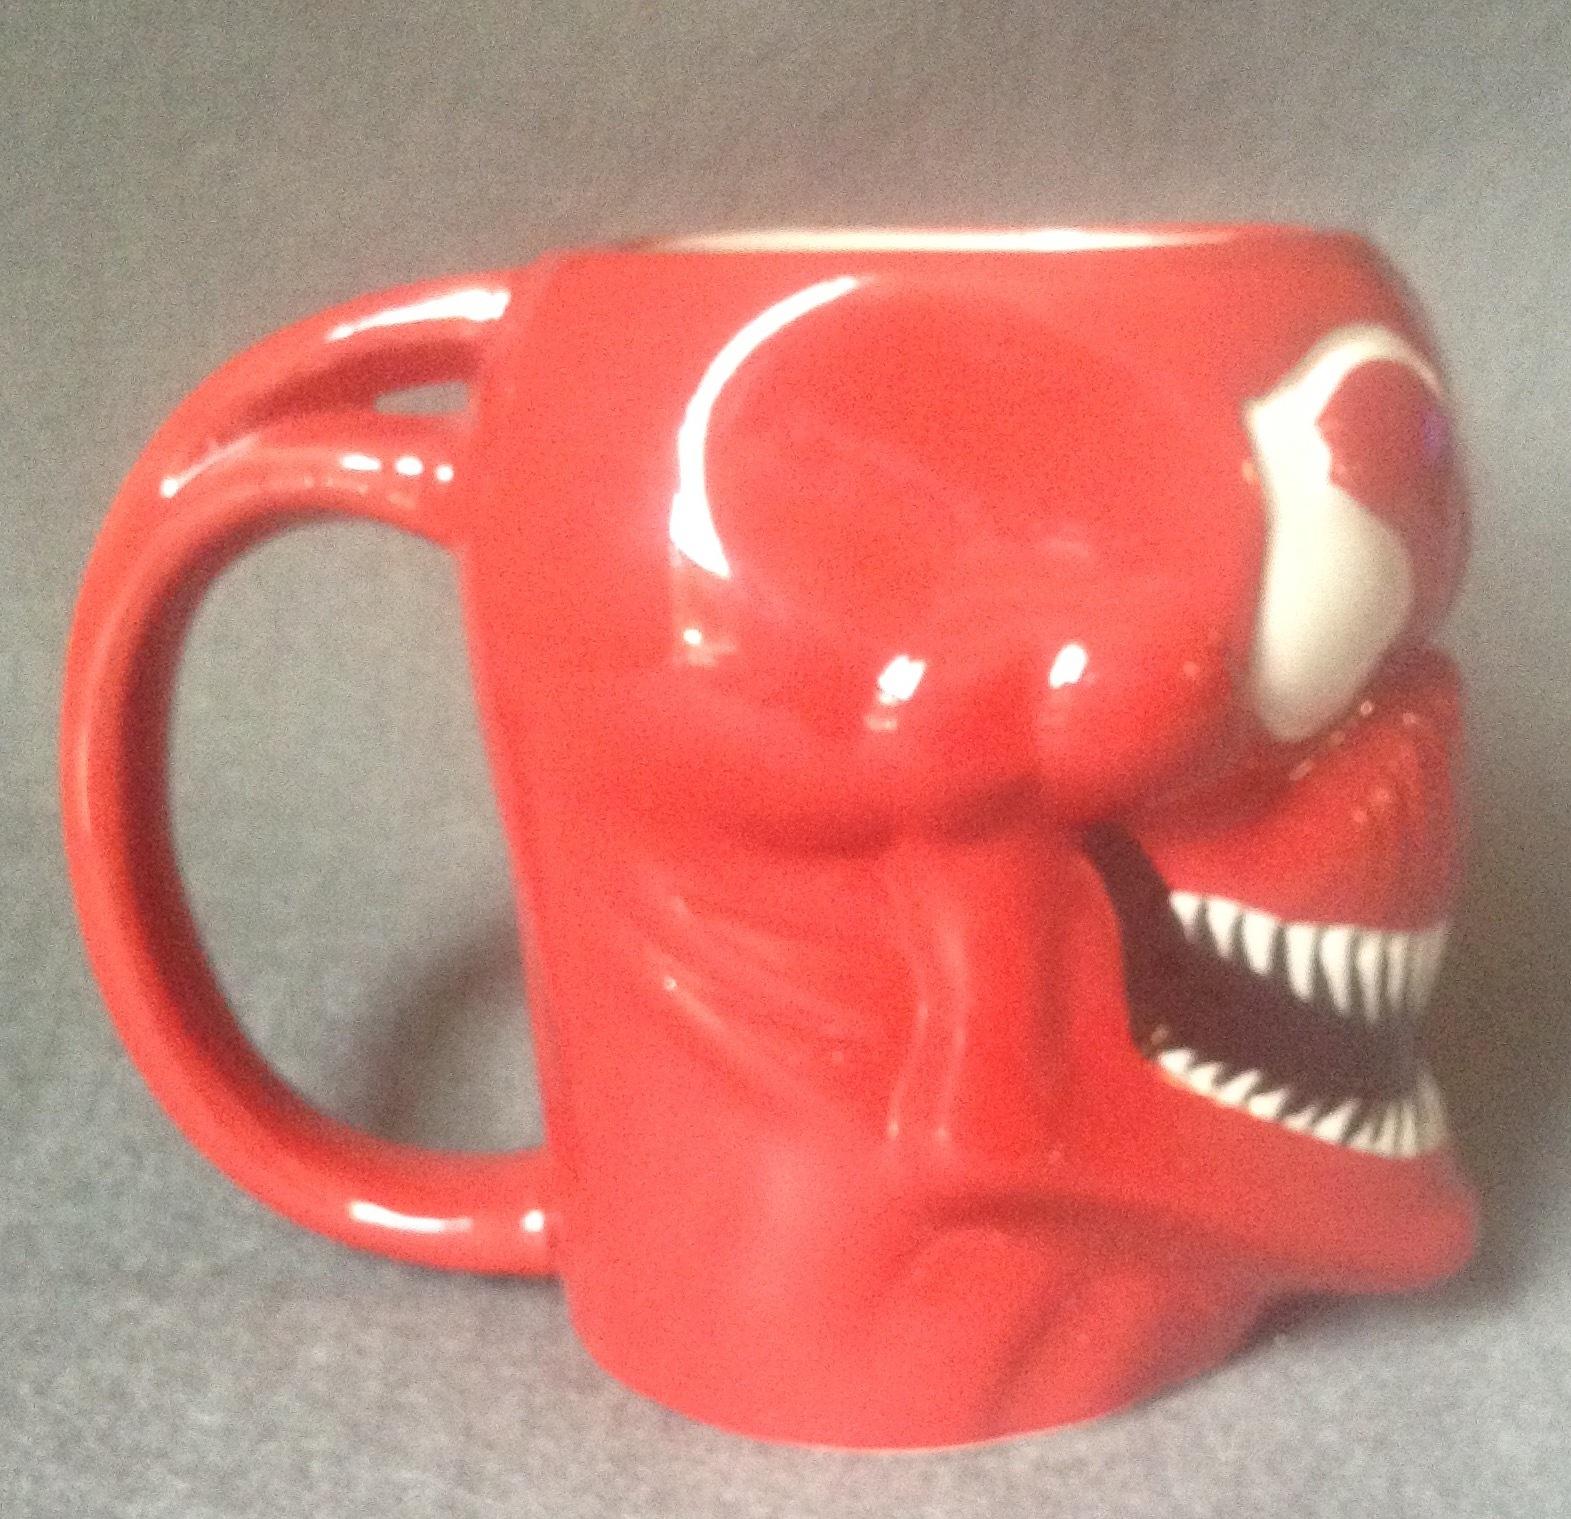 Marvel Spider-Man's Comic Book Villain Carnage Ceramic Red Coffee Mug 16 oz.